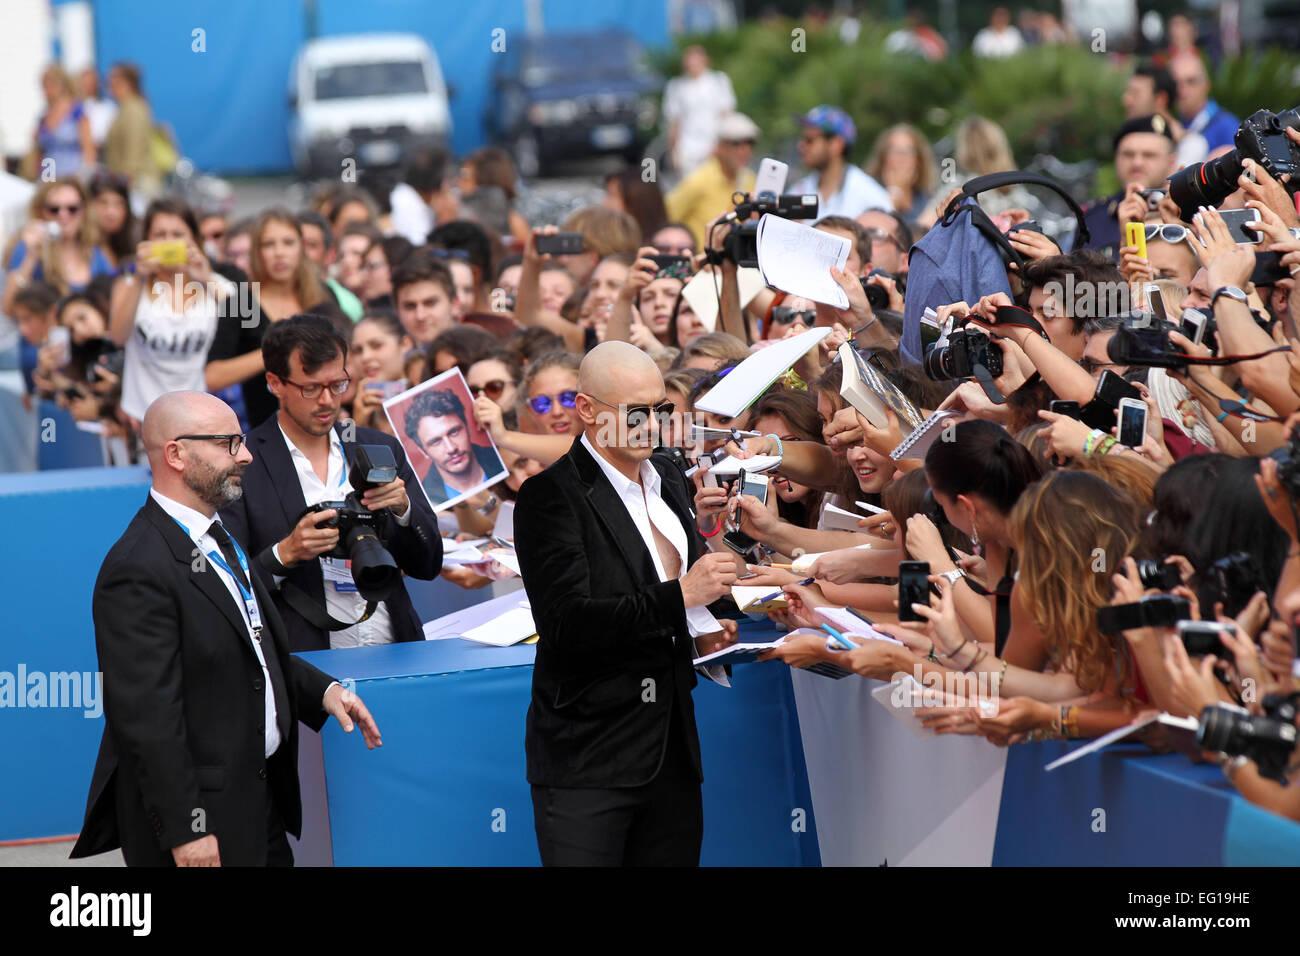 Italien, Venedig: US-Schauspieler und Regisseur James Franco gibt Autogramme Stockbild